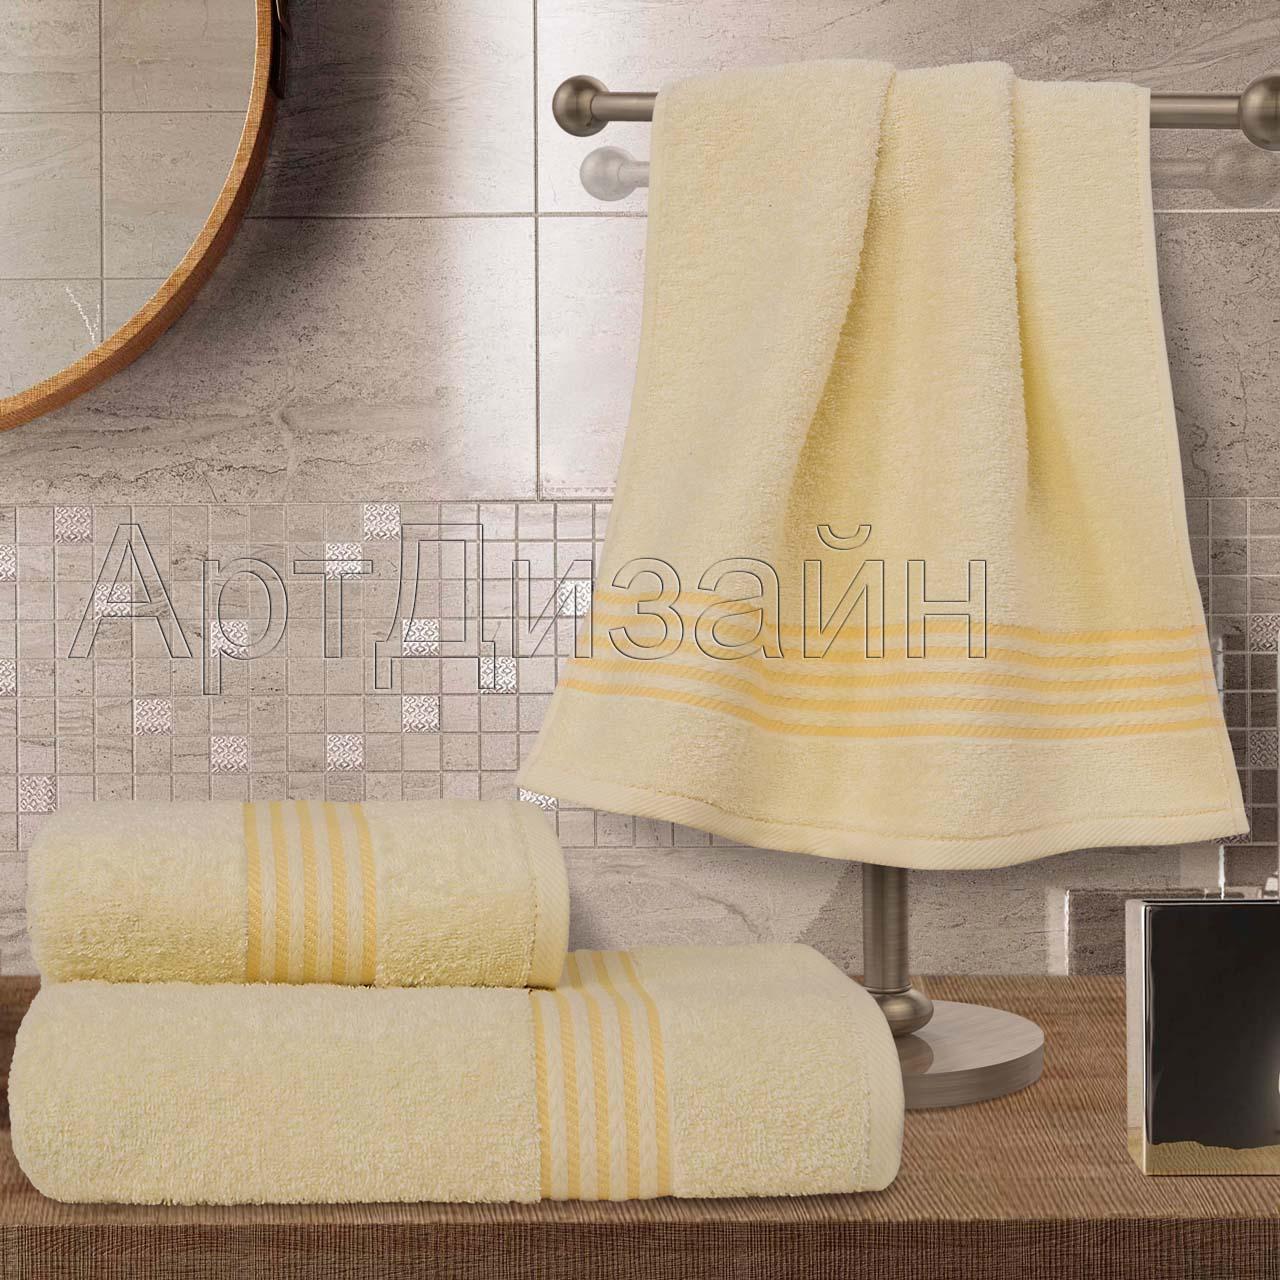 Полотенце Классик Ваниль р. 40х70Махровые полотенца<br>Плотность: 400 г/кв. м<br><br>Тип: Полотенце<br>Размер: 40х70<br>Материал: Махра